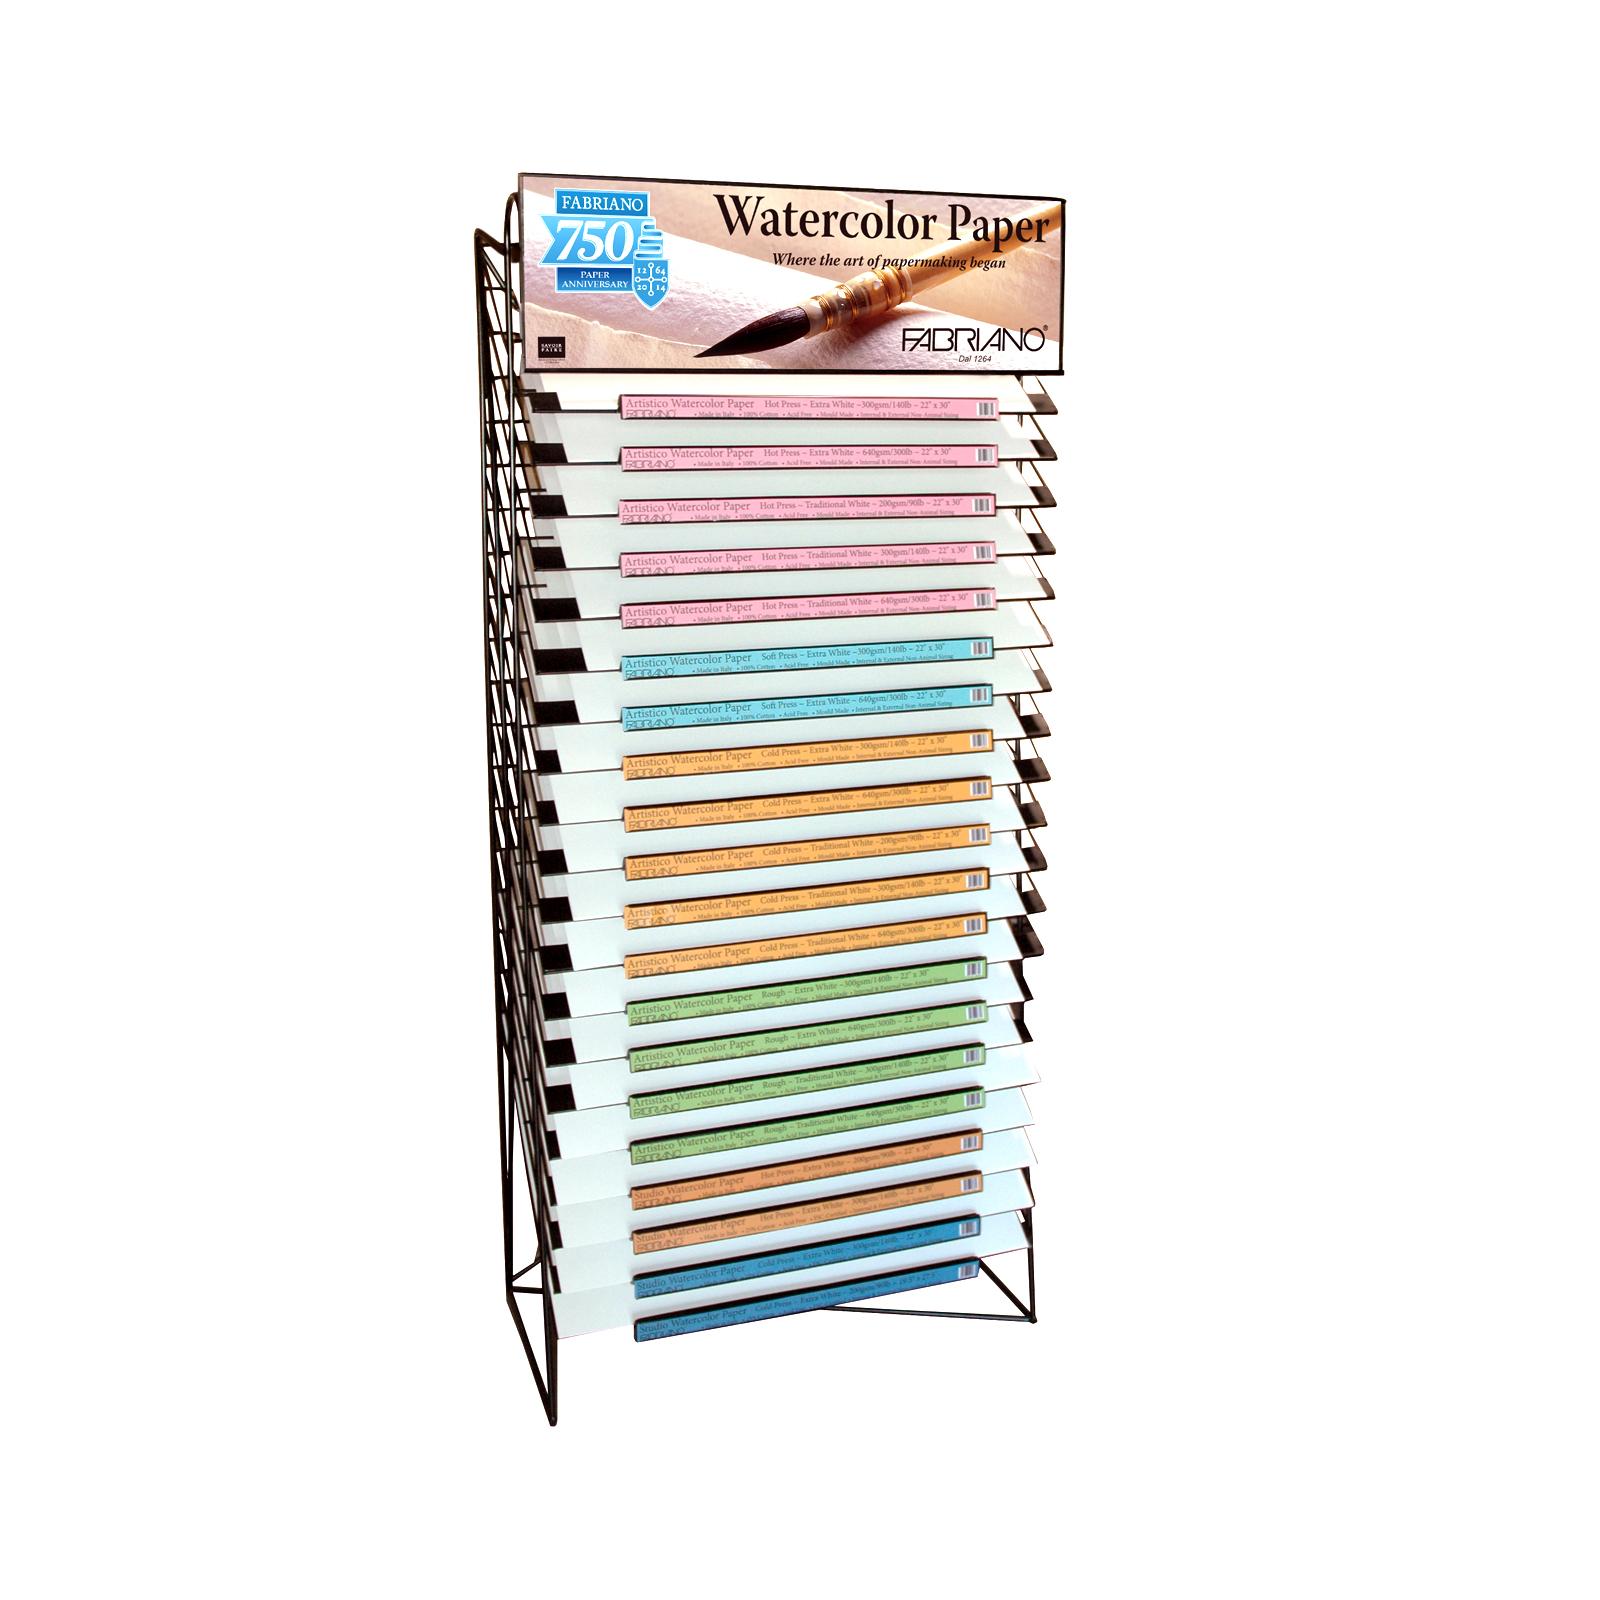 jcm wire rack paper display 2012 20